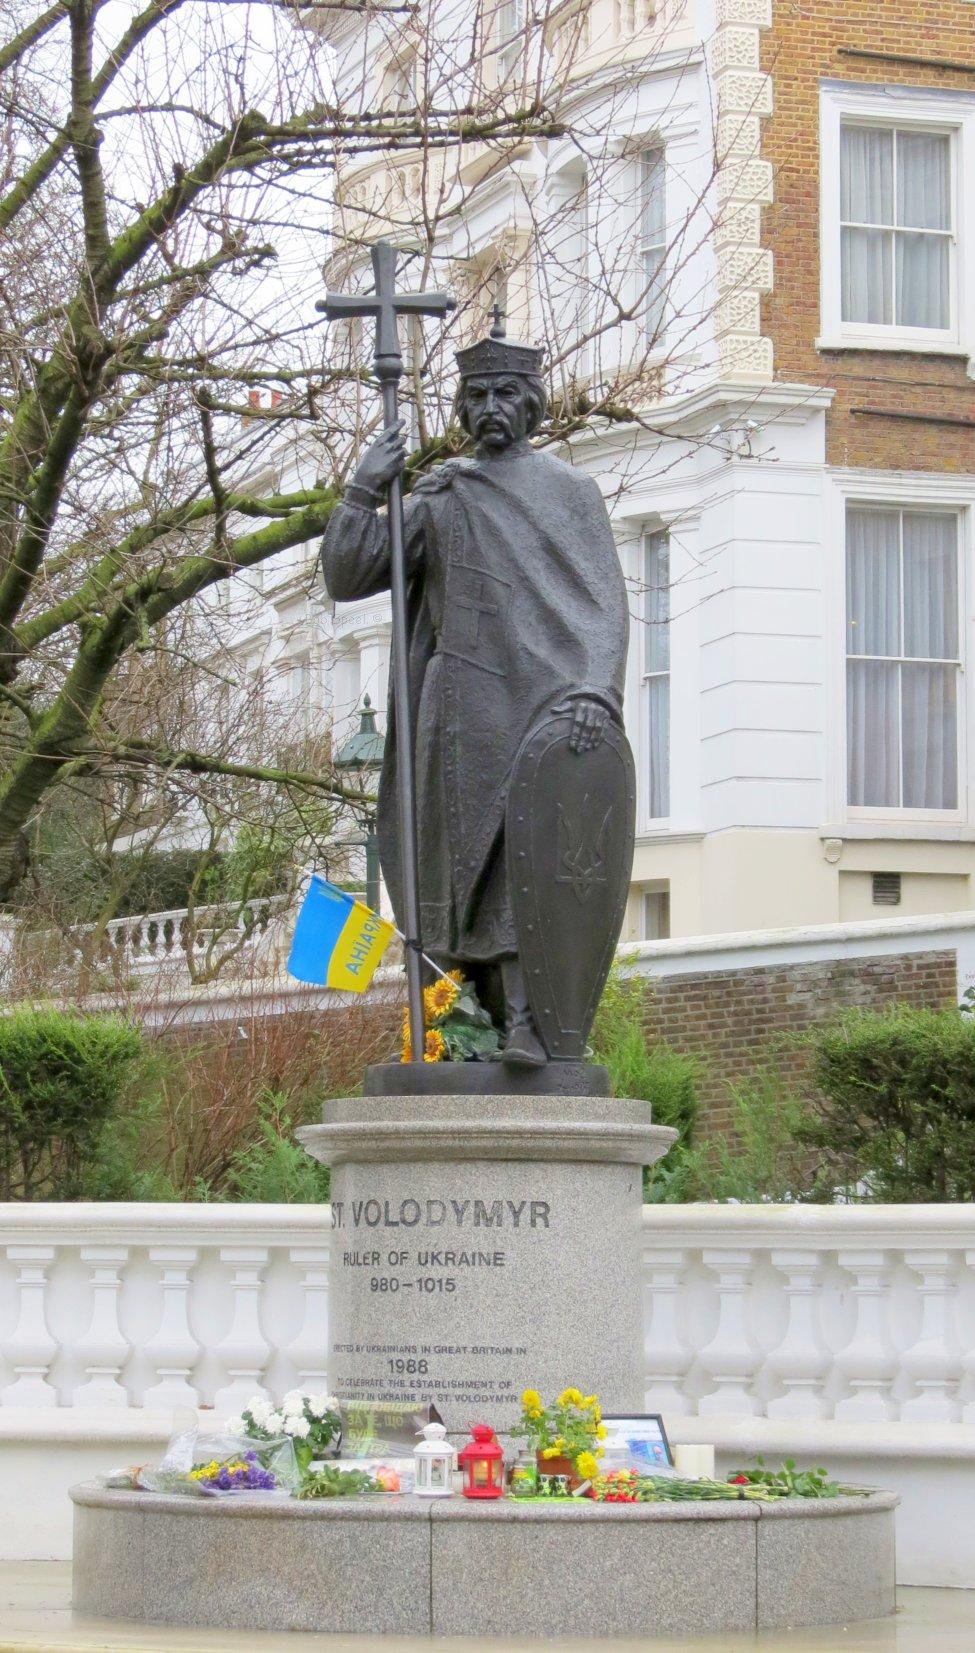 http://www.speel.me.uk/sculptlondon/lonpich/hollandpk/hollandpkvolodymyr2.jpg